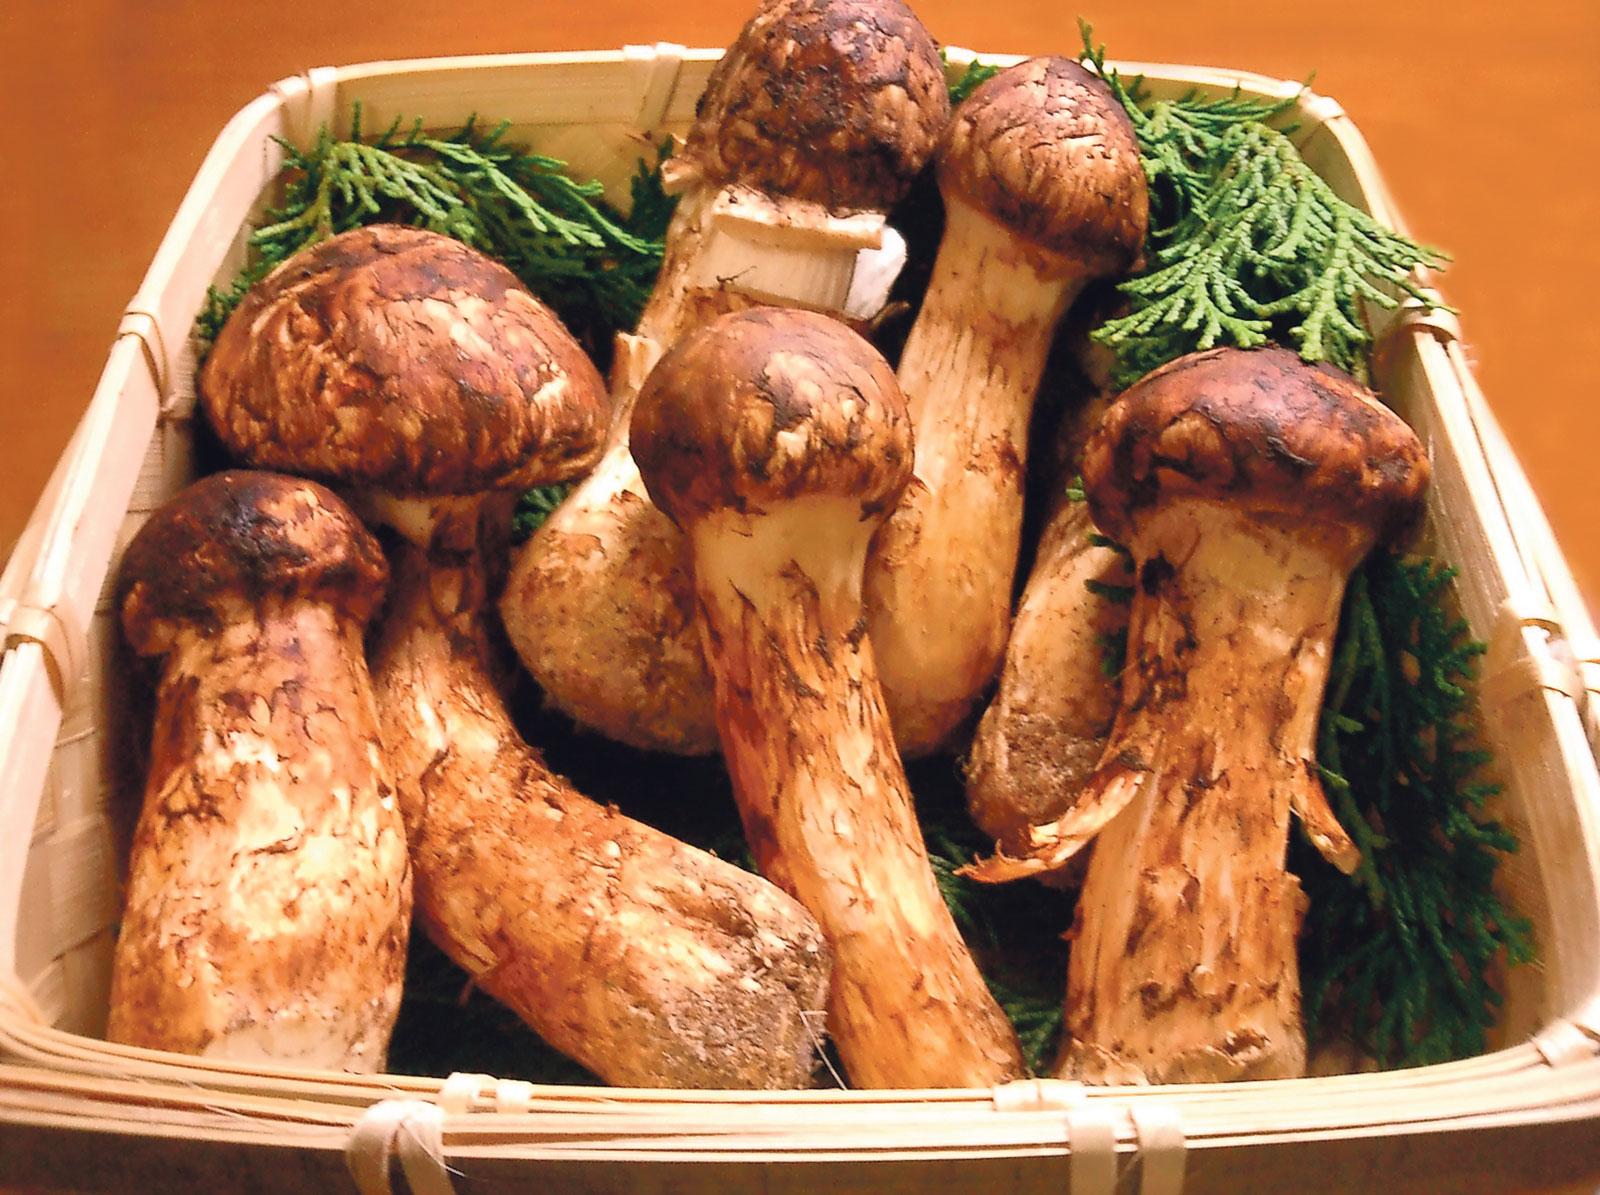 PunjabKesari, Matsutake Mushrooms Image, Expensive Food Items Image, मैटसुटेक मशरूम इमेज